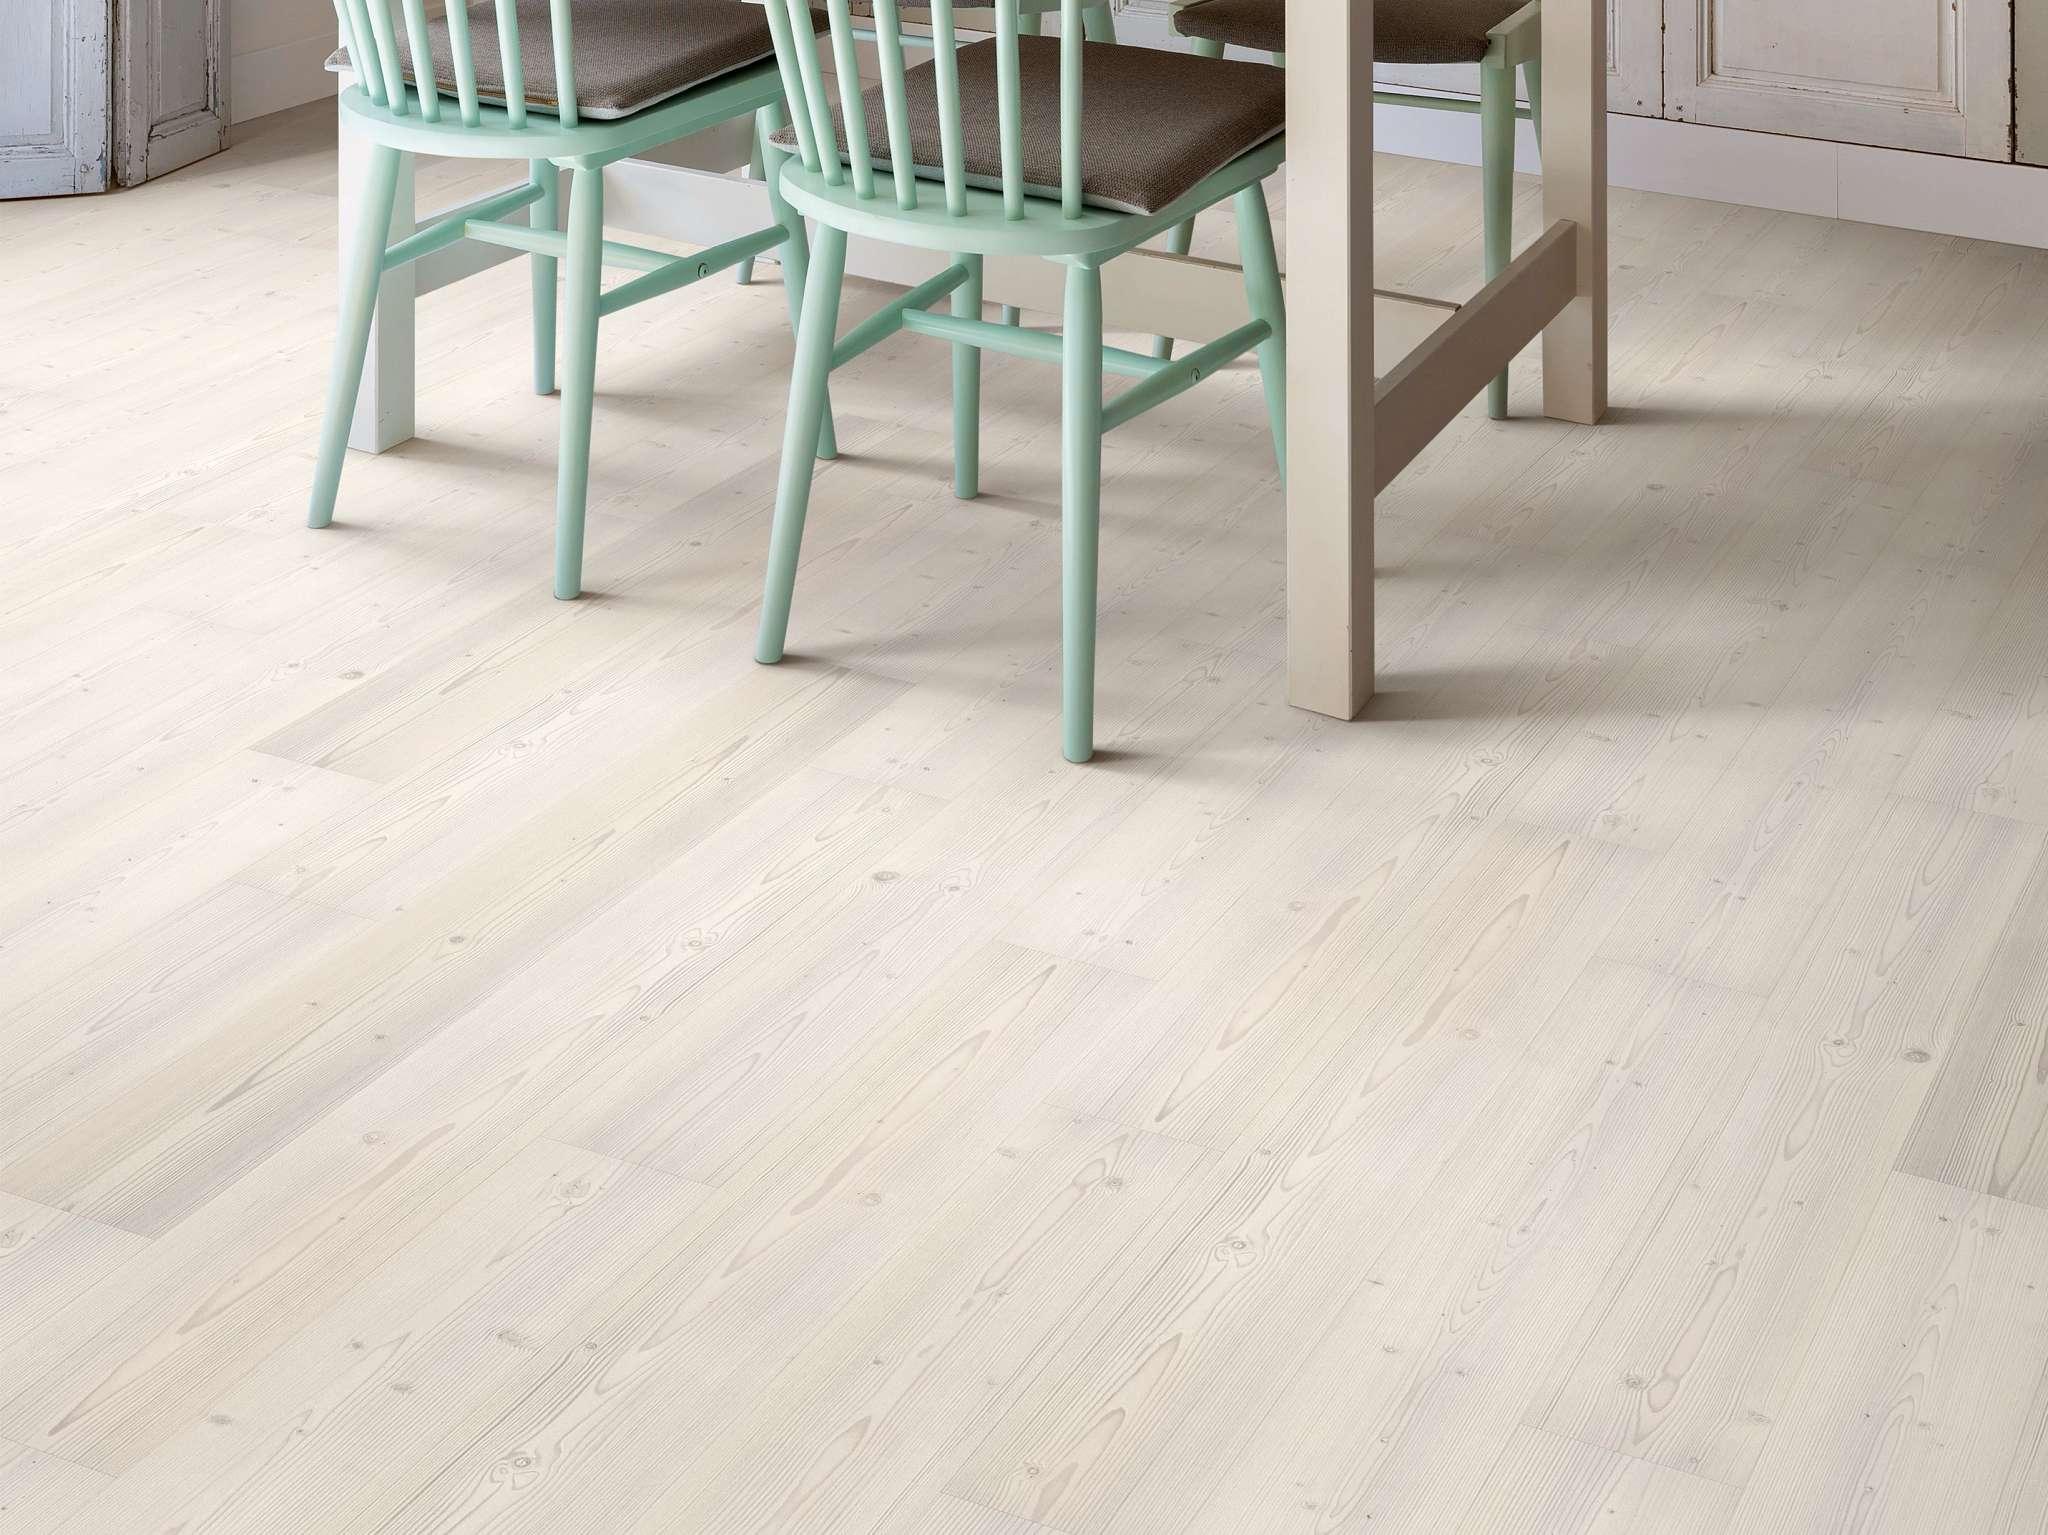 Cadence Sl449 Paper White Laminates, Shaw Laminate Flooring Versalock